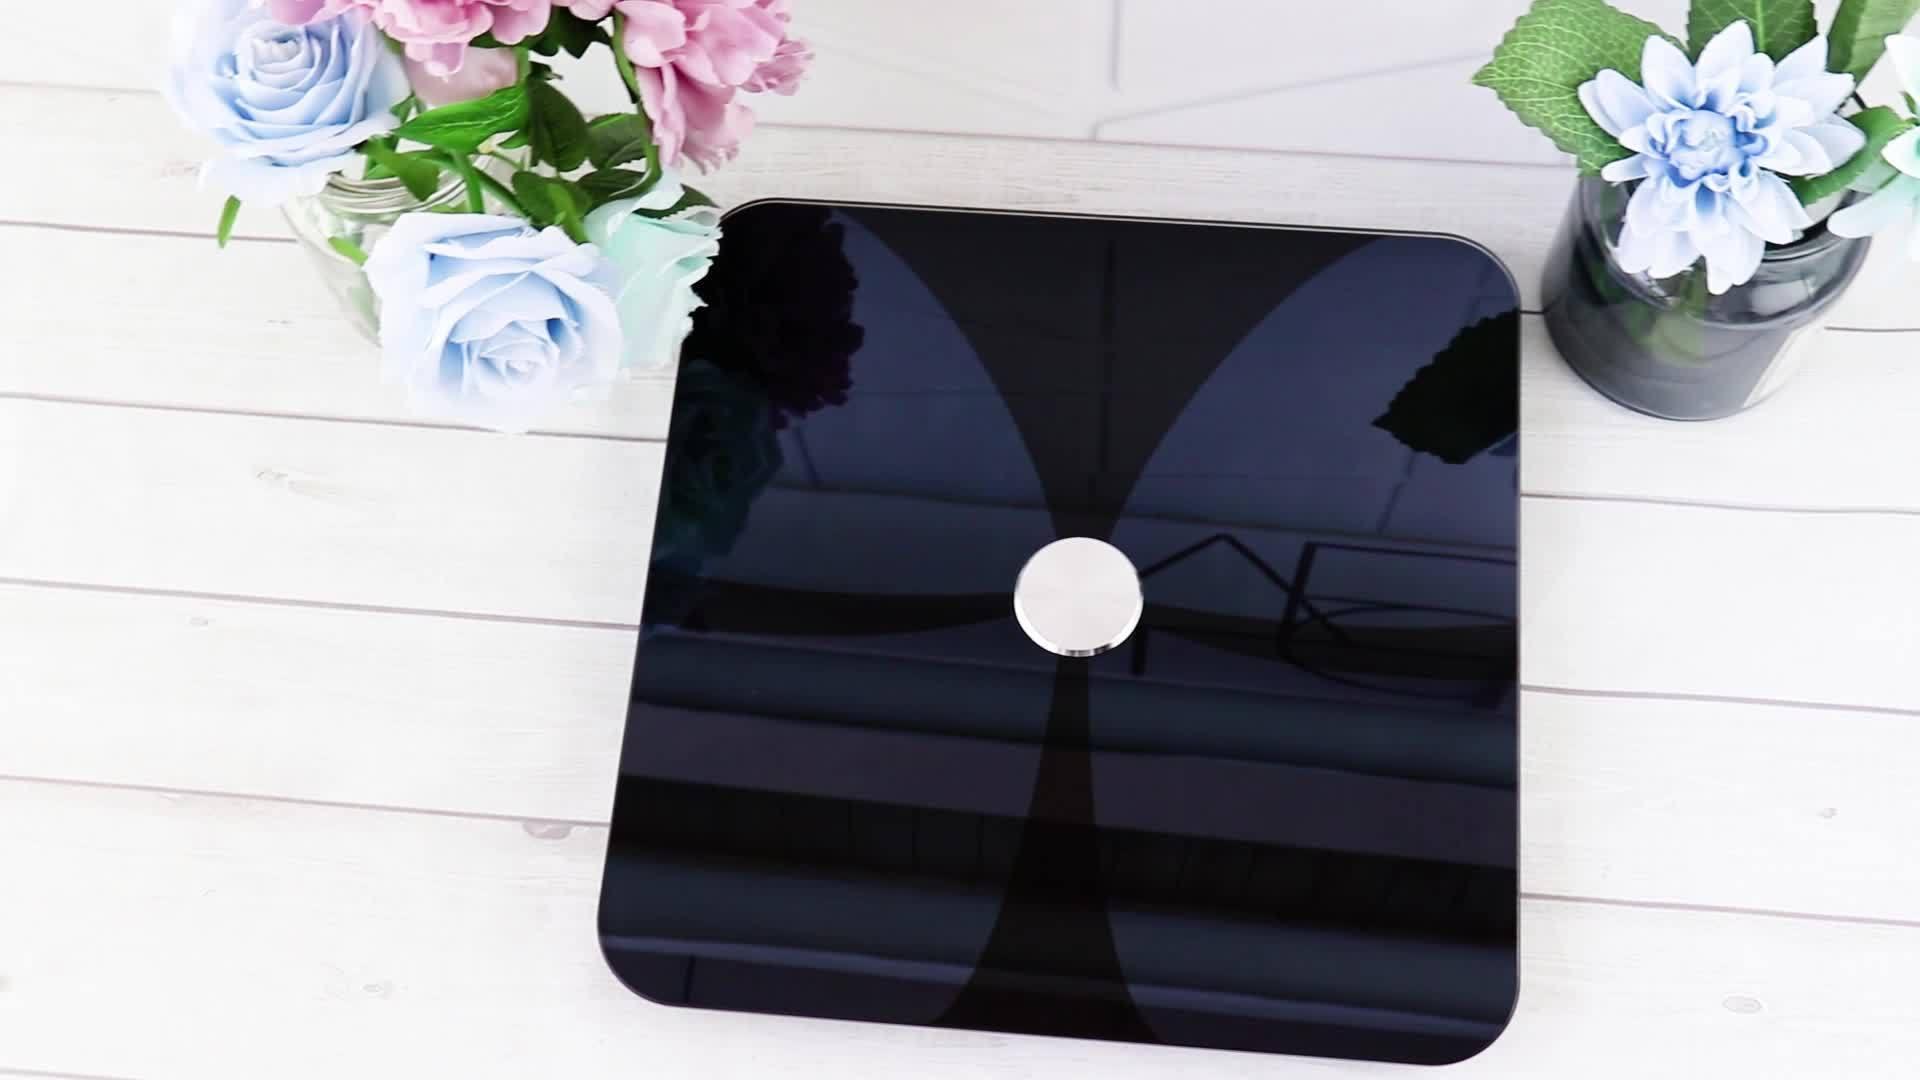 Digitaal ITO-platform BMI Bluetooth Smart Body Fat Scale